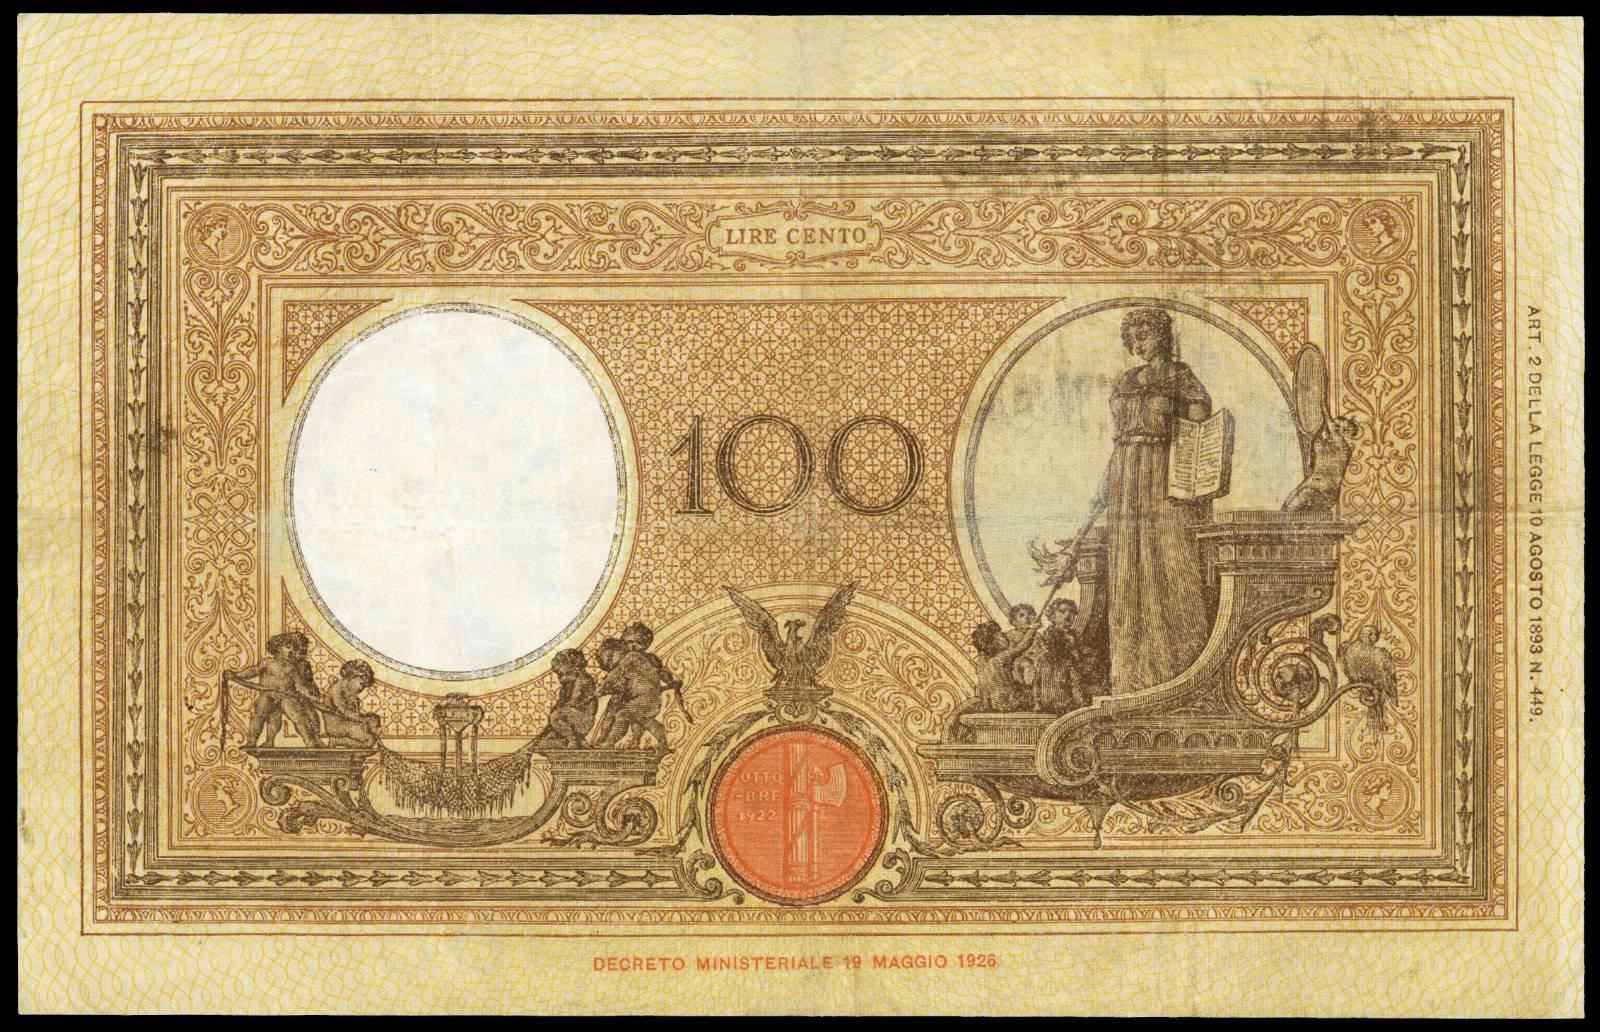 100 Italian Lira banknote